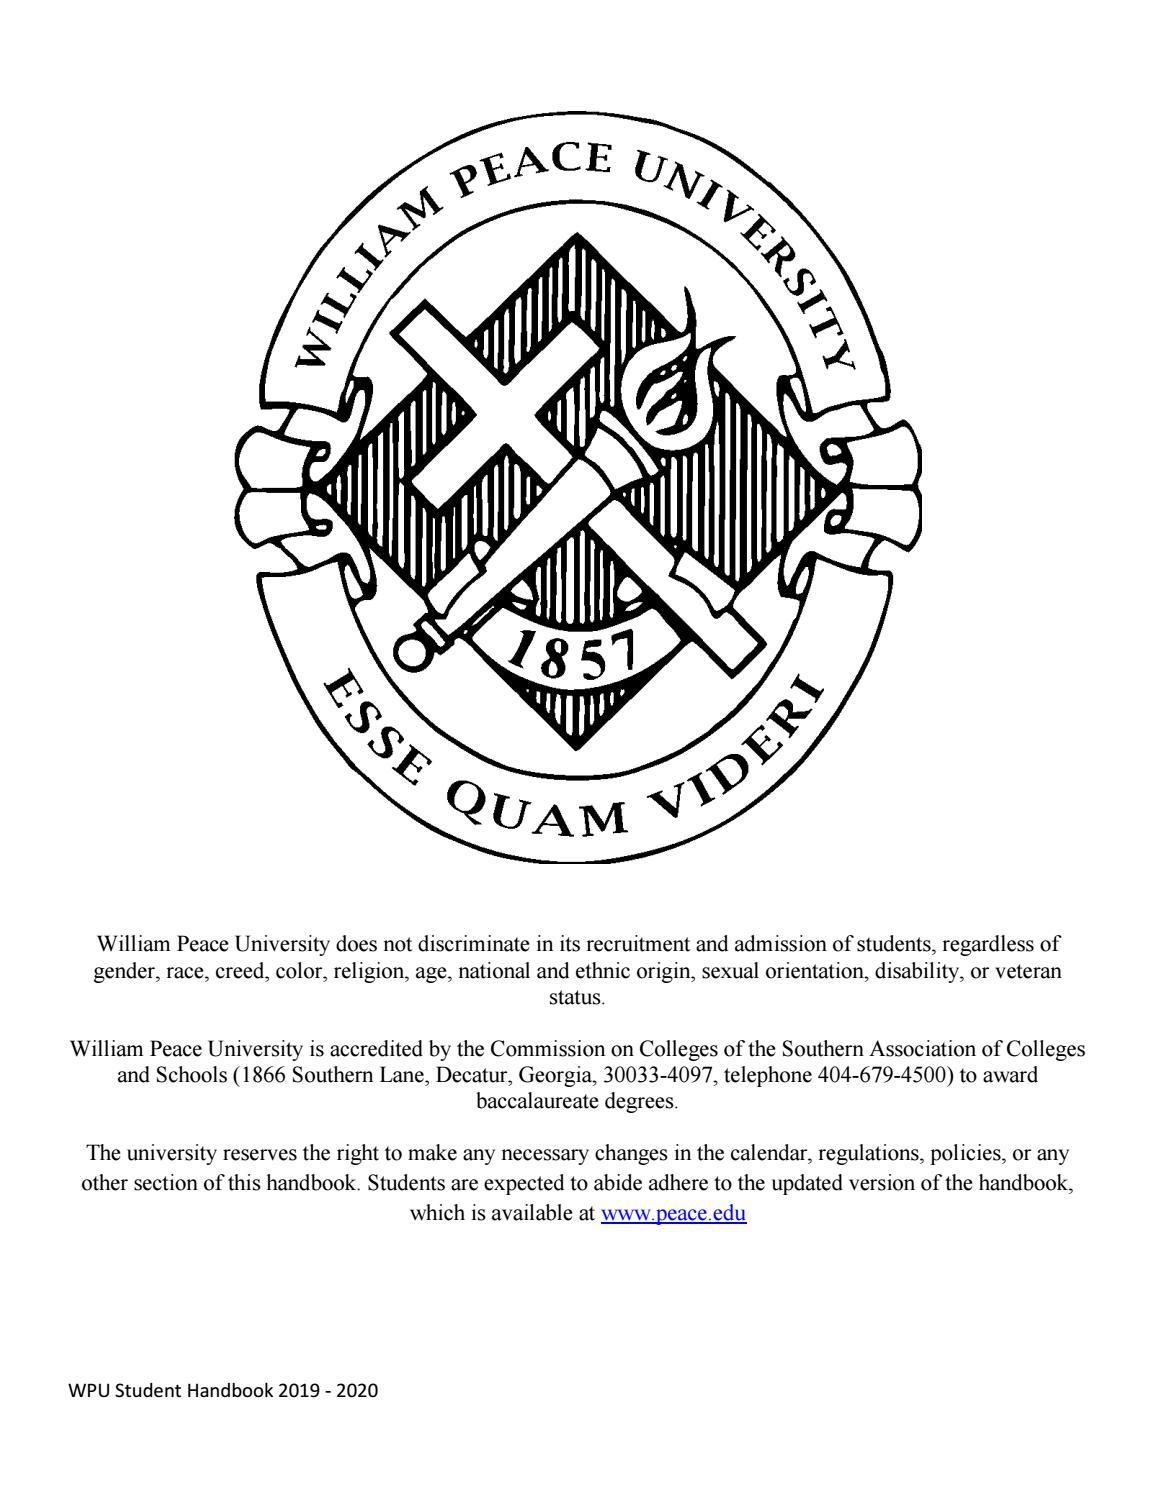 WPU 2019-2020 Student Handbook by William Peace University